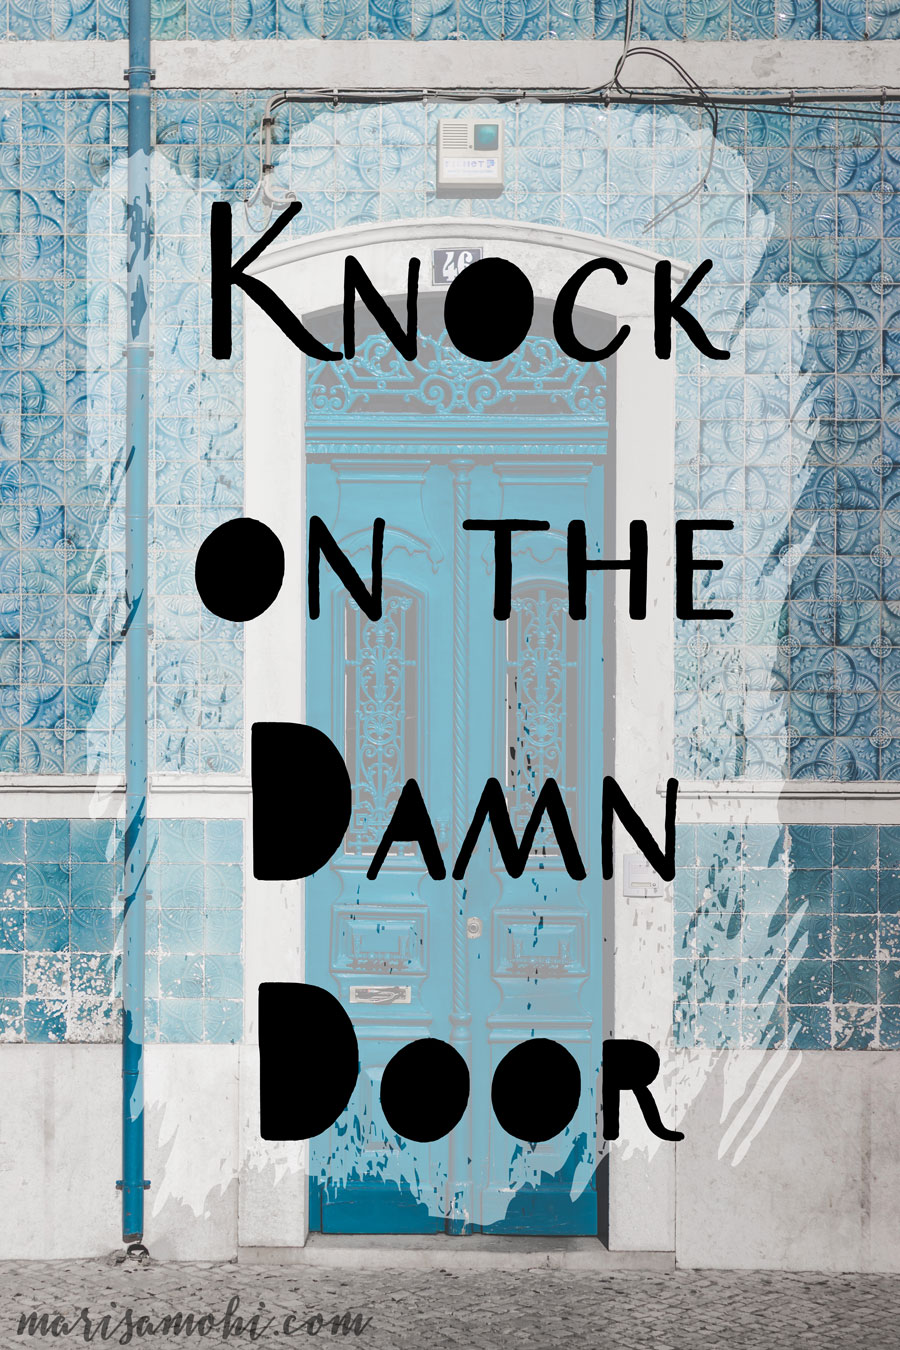 Knock on the damn door!